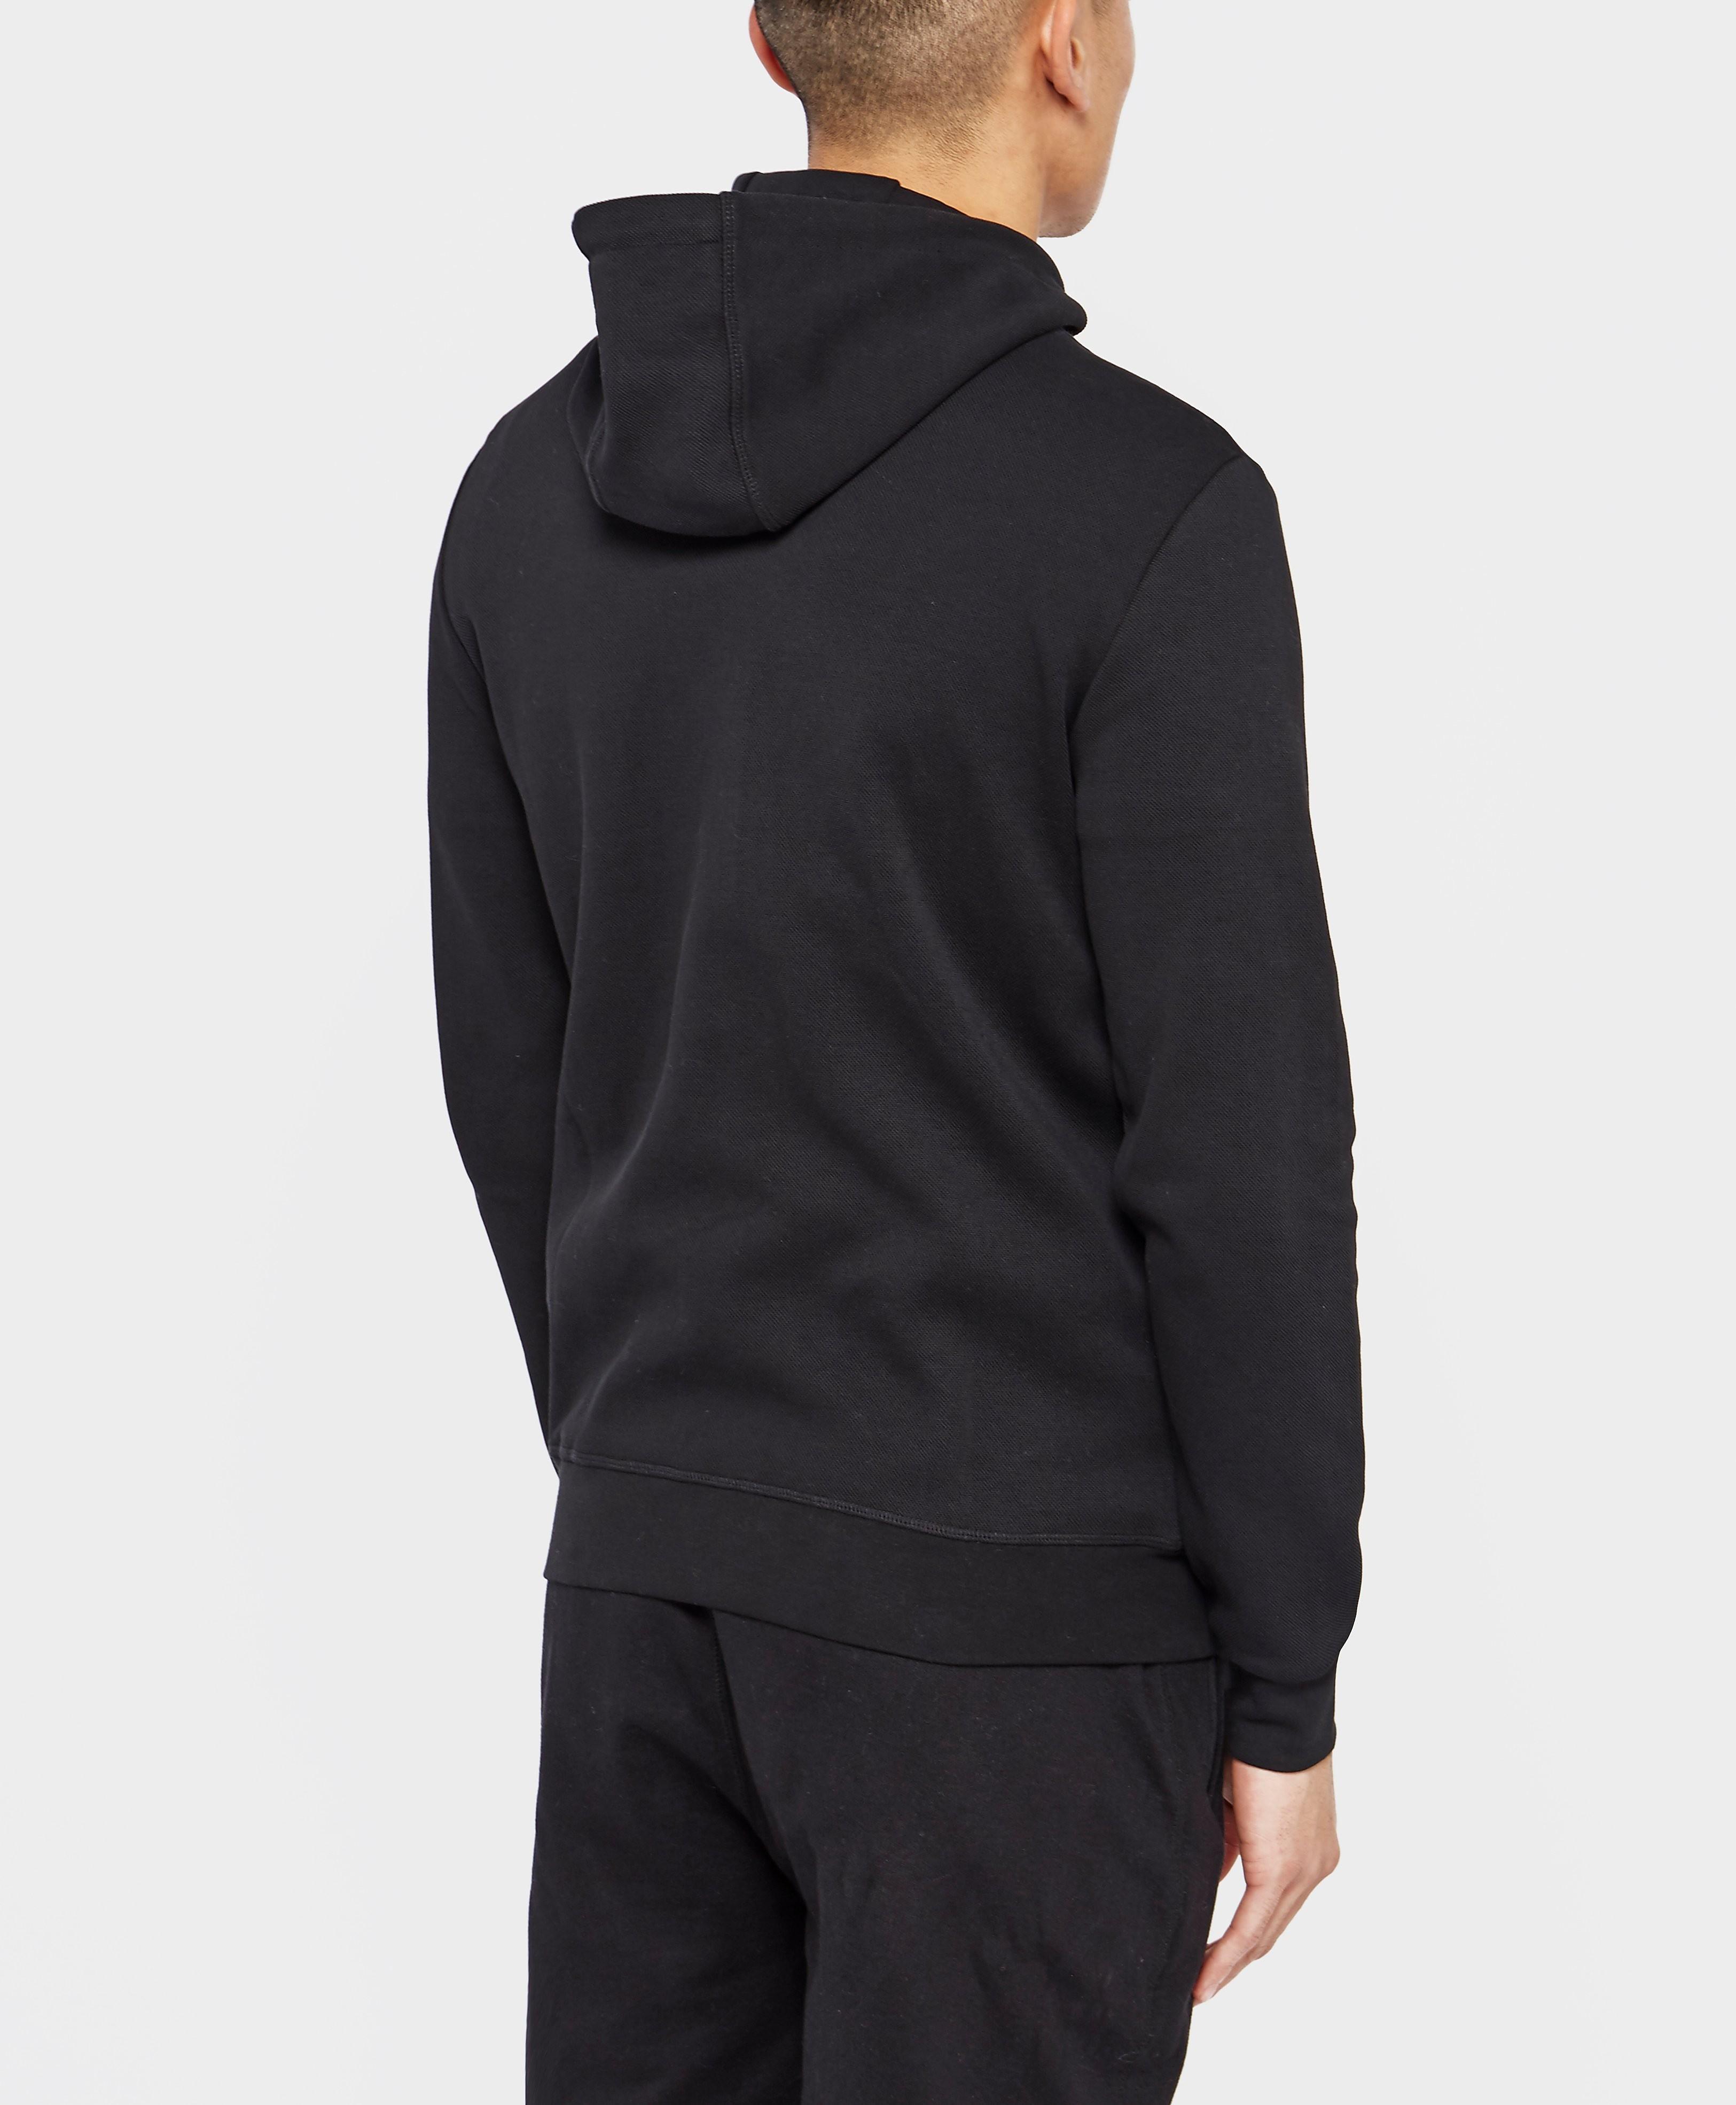 Antony Morato Plaque Full-Zip Hoodie